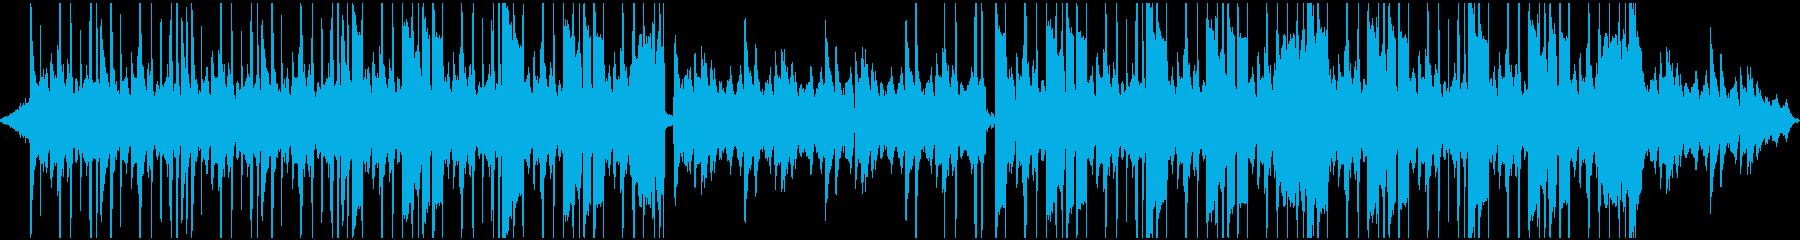 Lofi hip hop's reproduced waveform